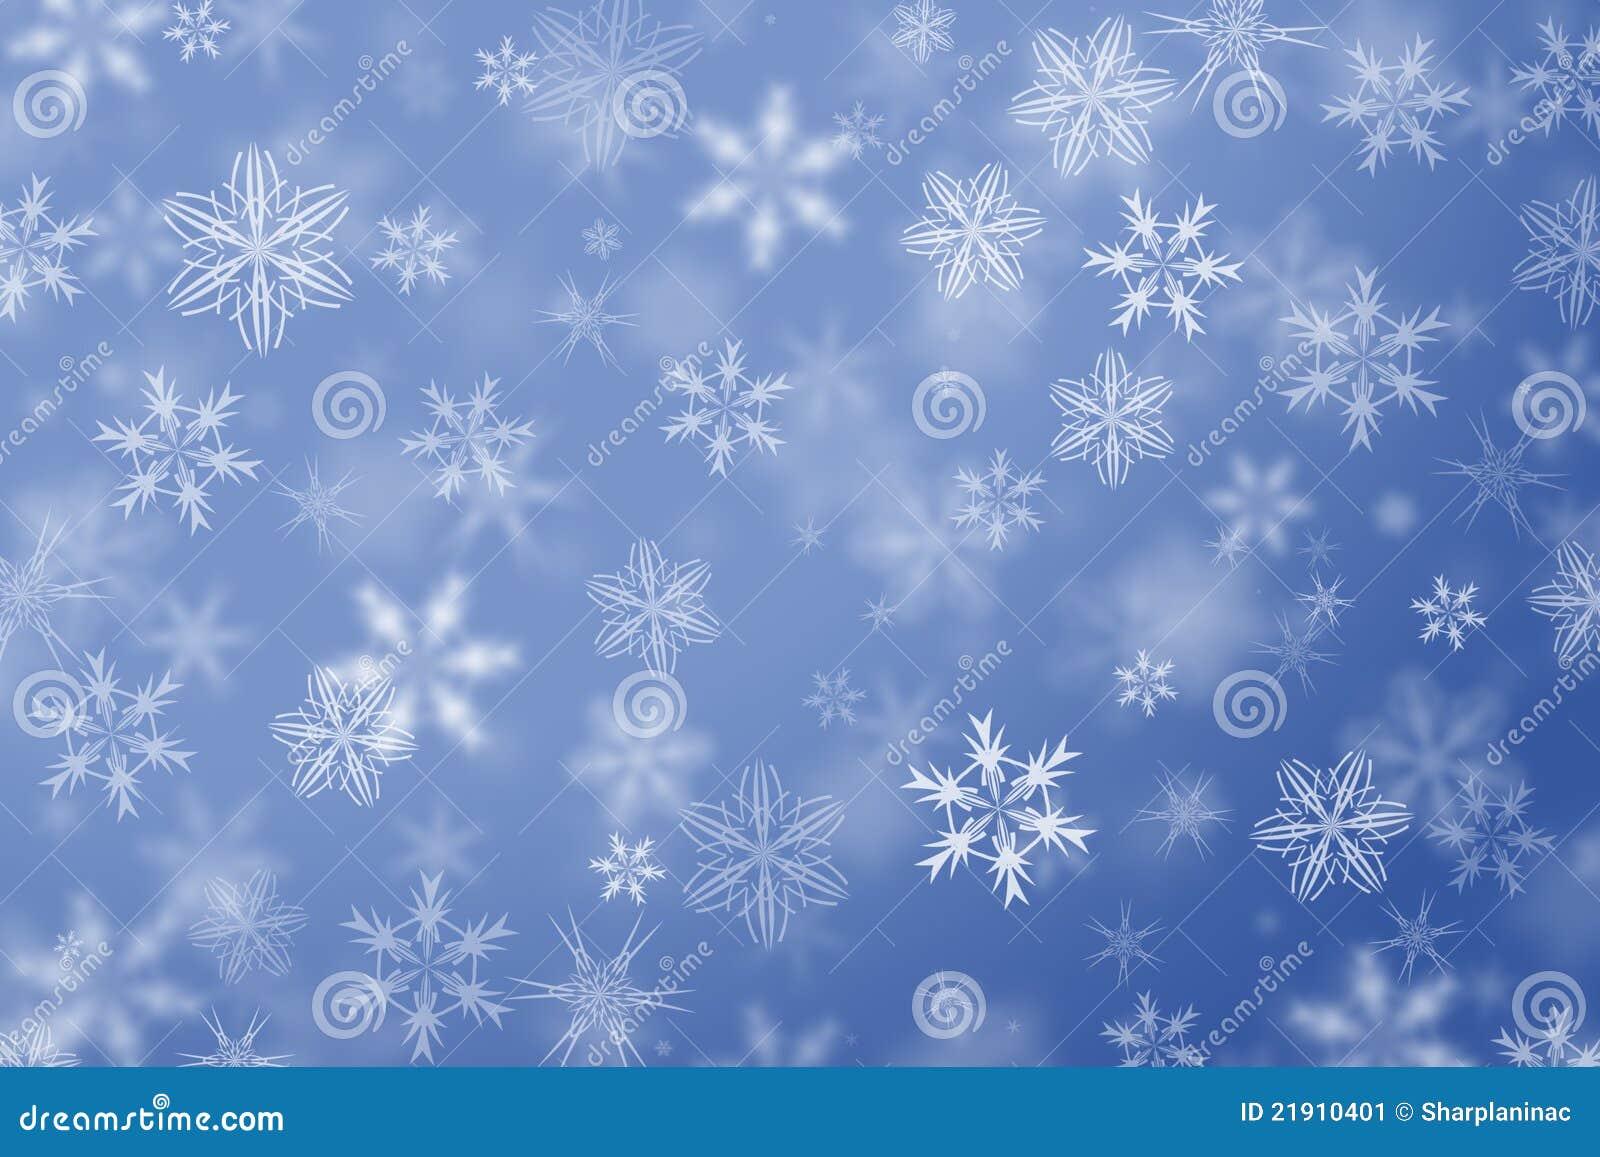 Snowflakes Falling Winter Background. Stock Image - Image: 21910401